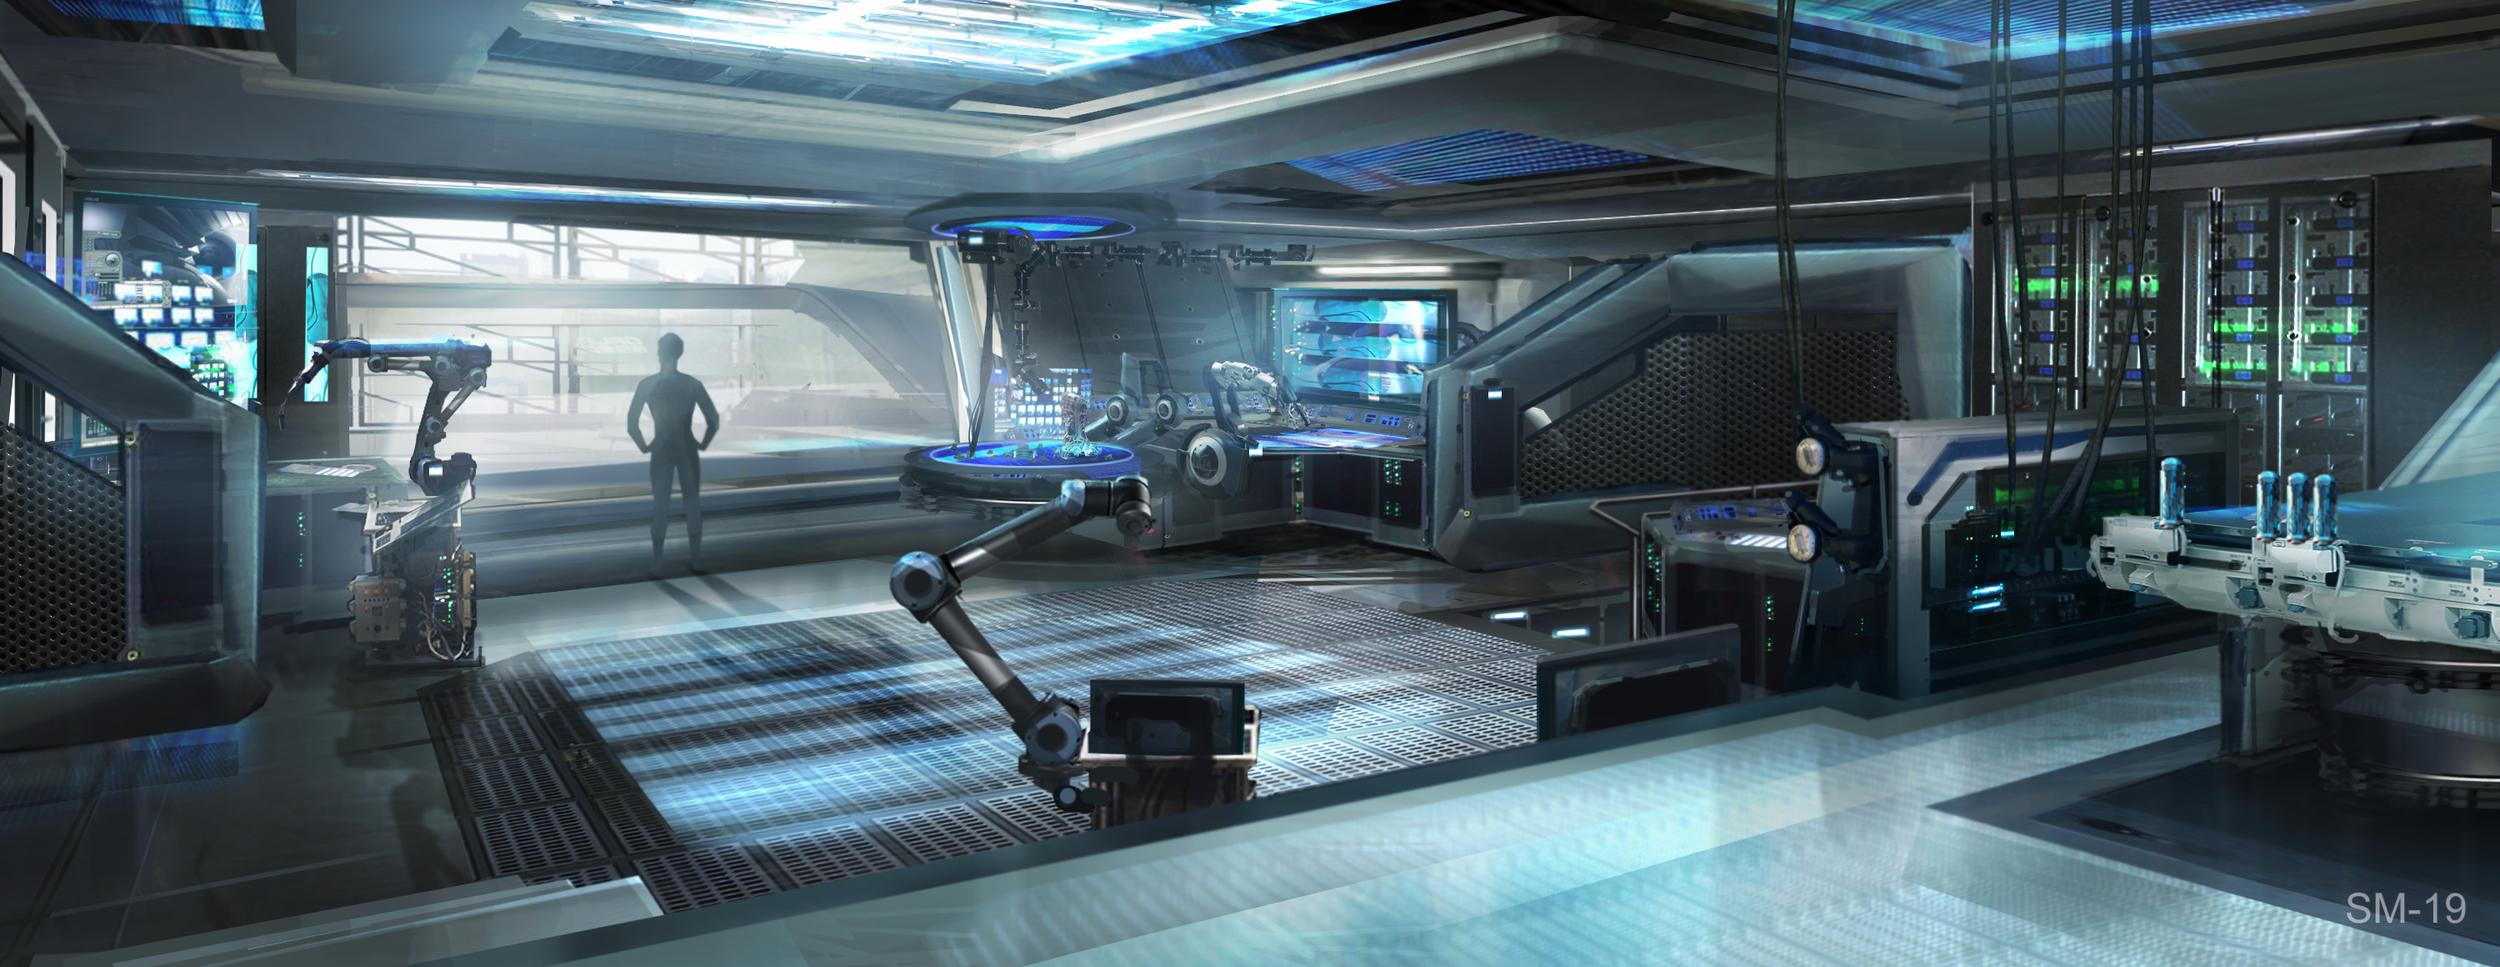 tony-stark-lab.jpg